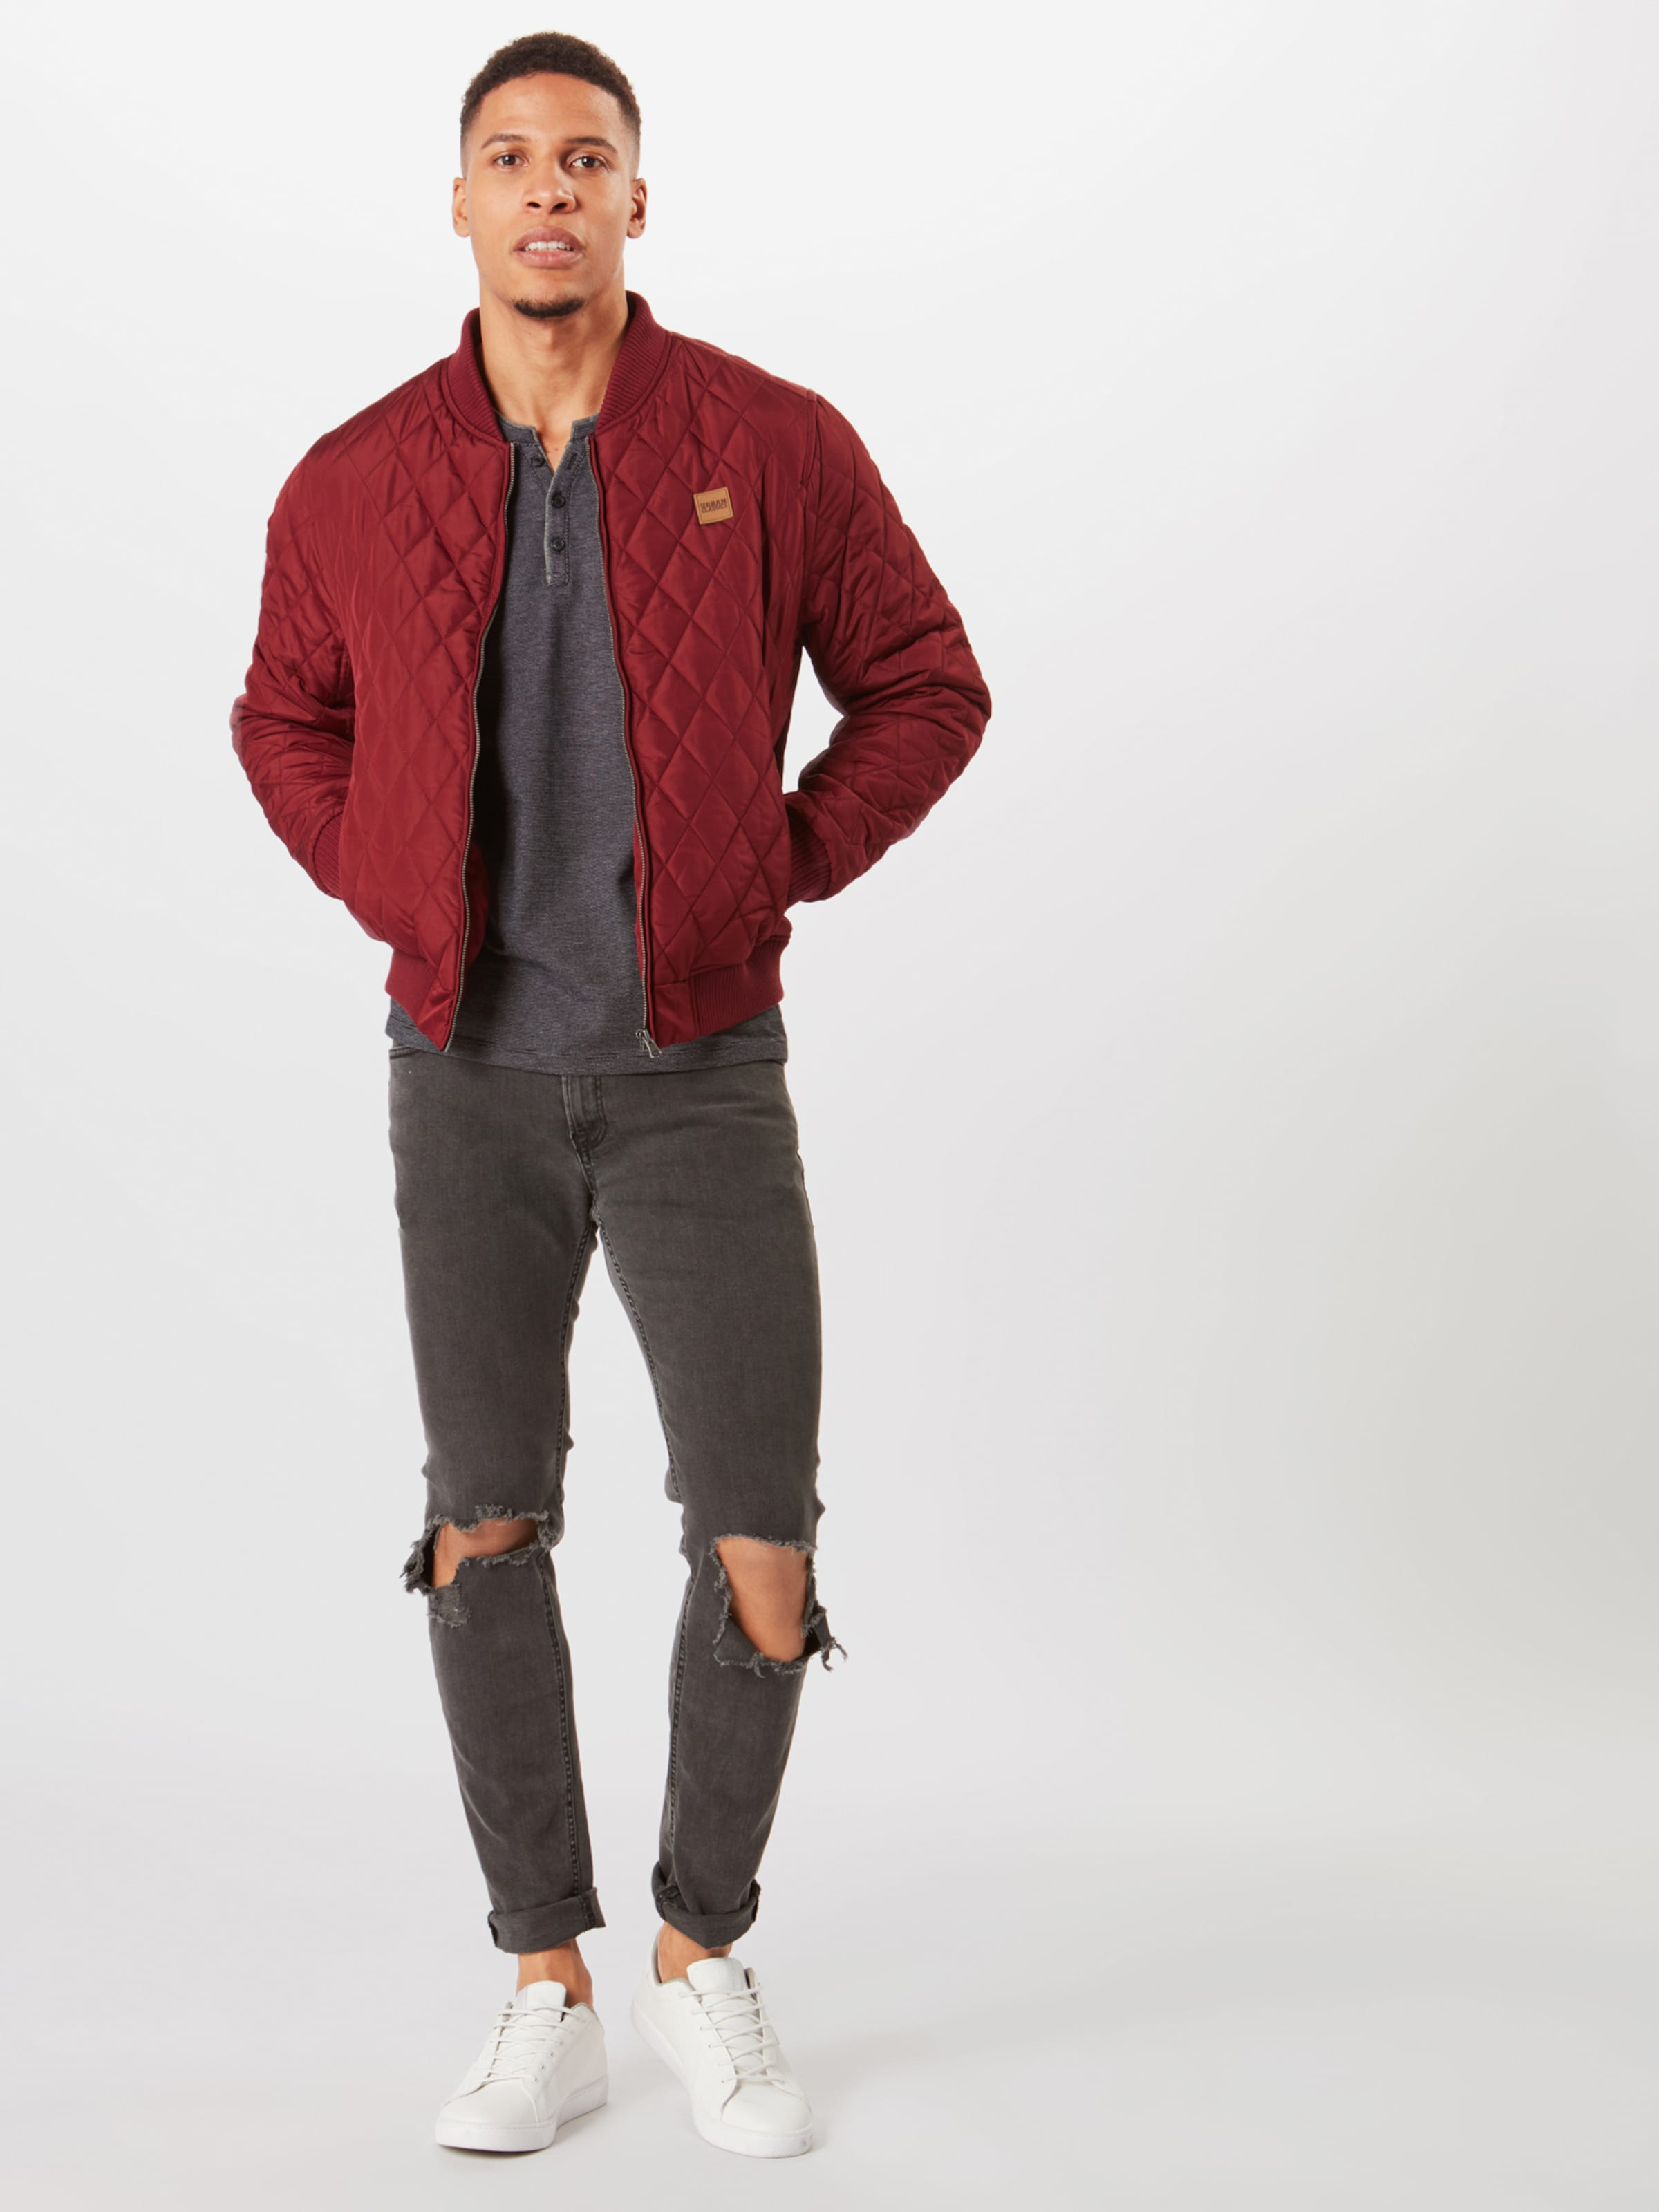 S oliver Shirt Label In Schwarzmeliert Red ULSzpVqGMj